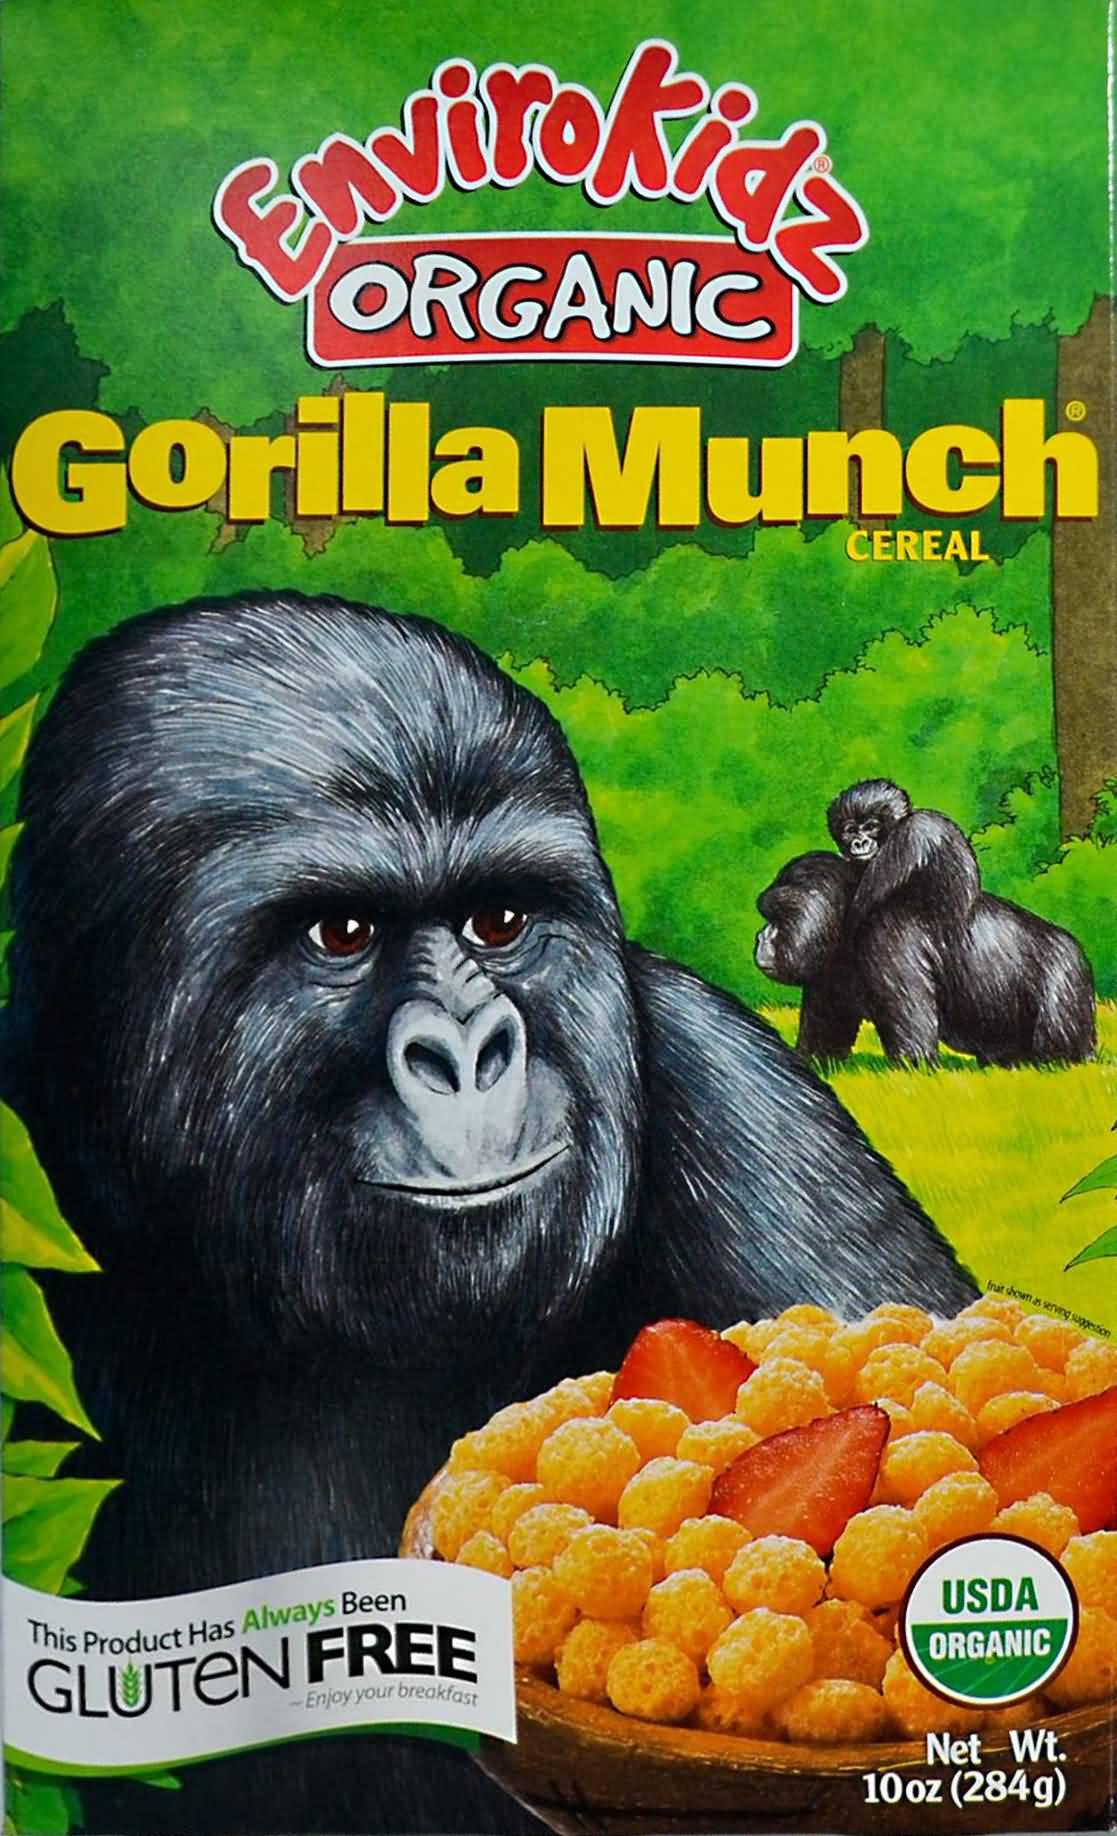 Gorilla Munch Meme Funny Image Photo Joke 07